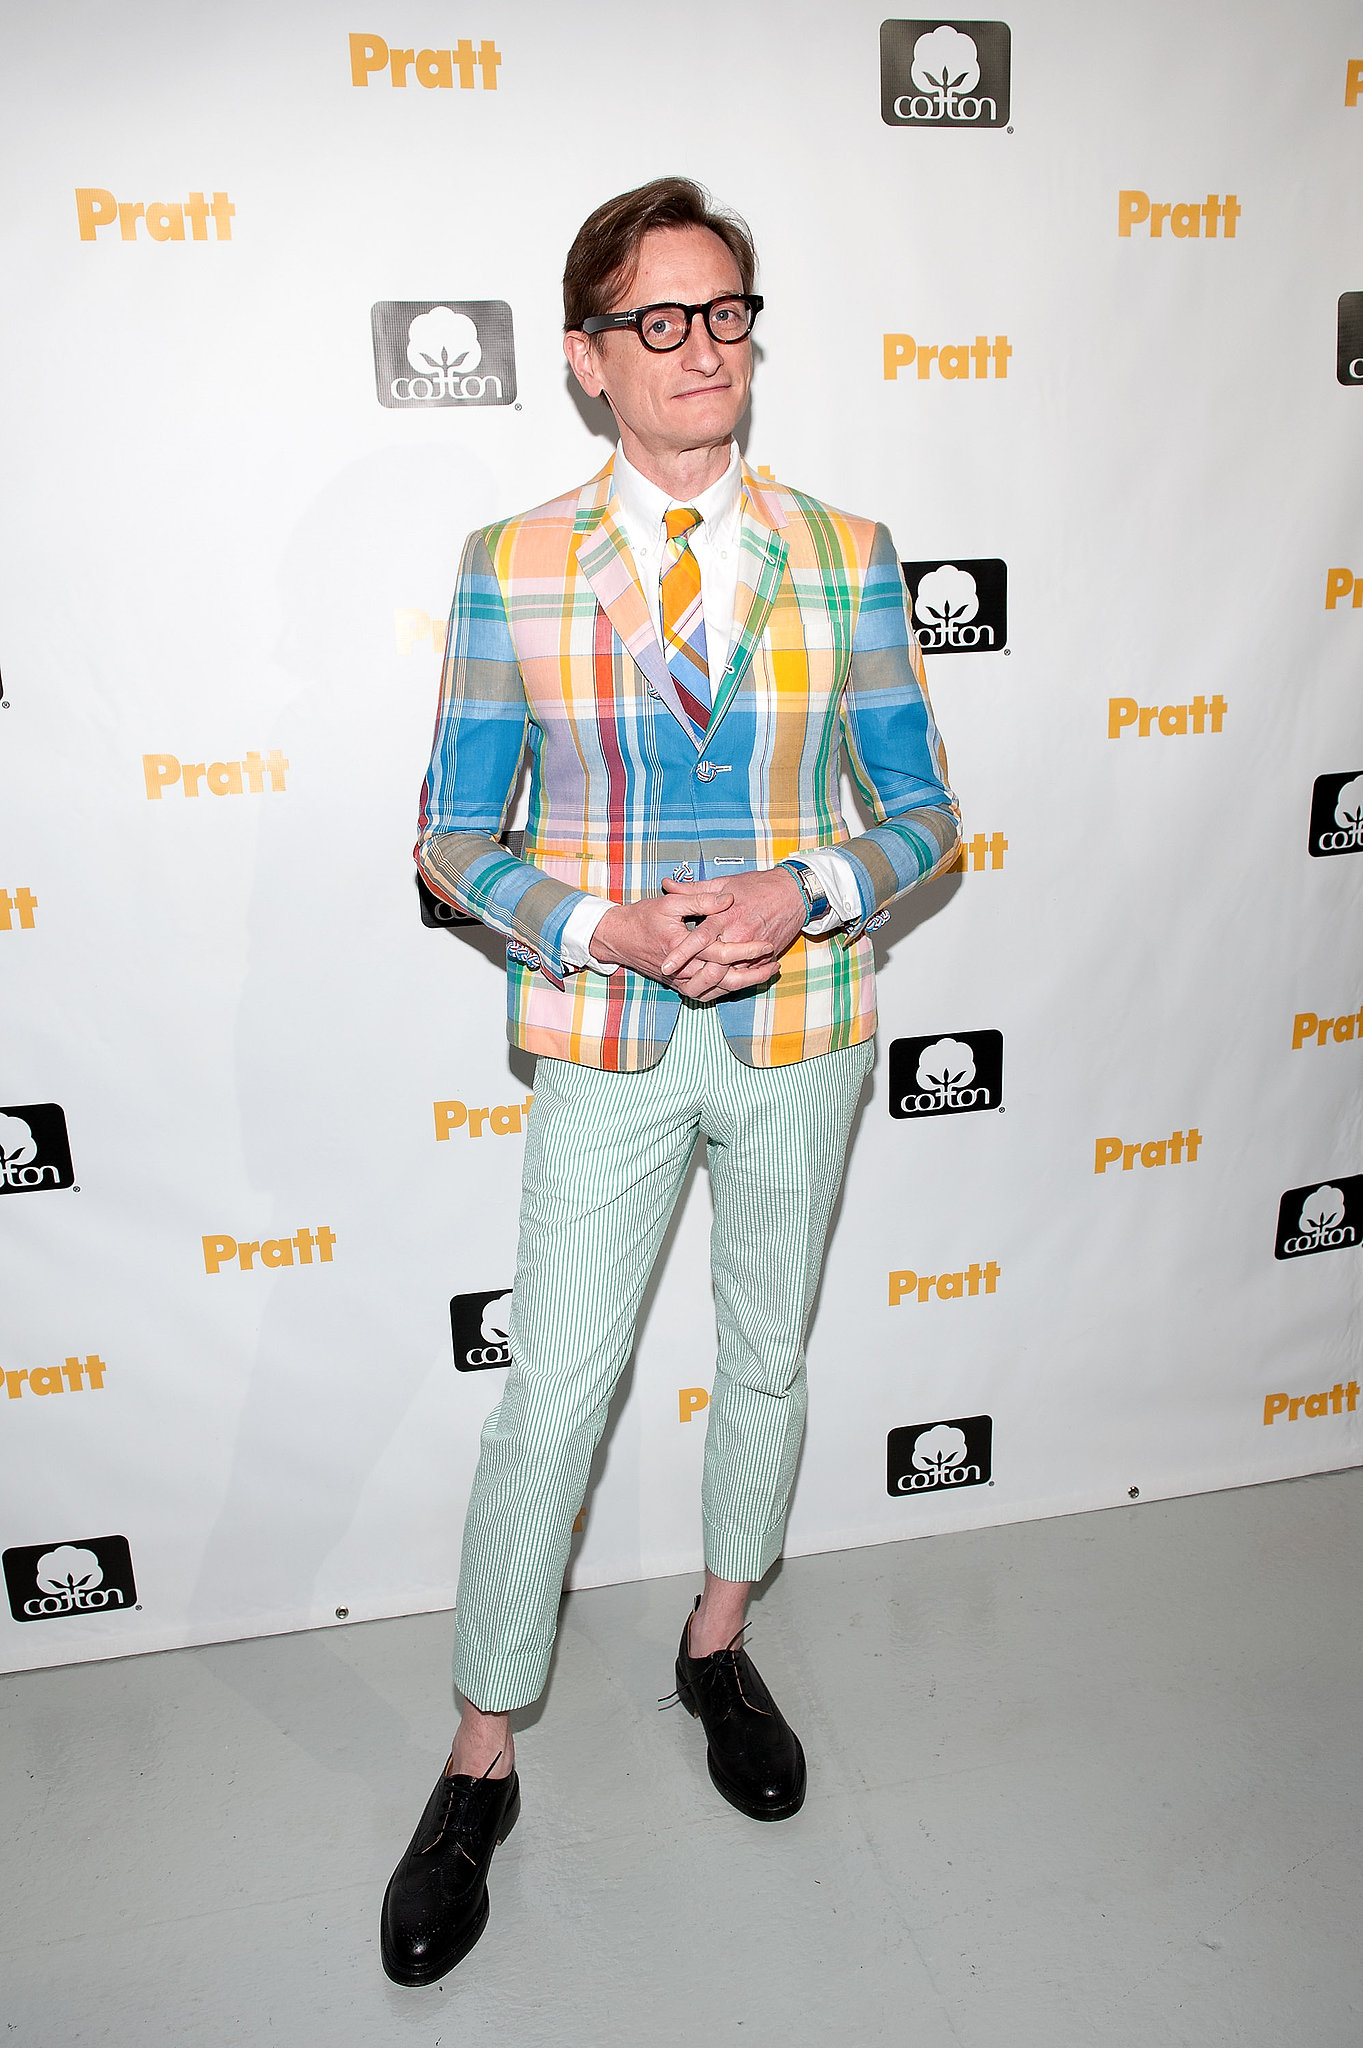 Hamish Bowles at the 114th annual Pratt Institute Fashion Show & Award Presentation in New York.